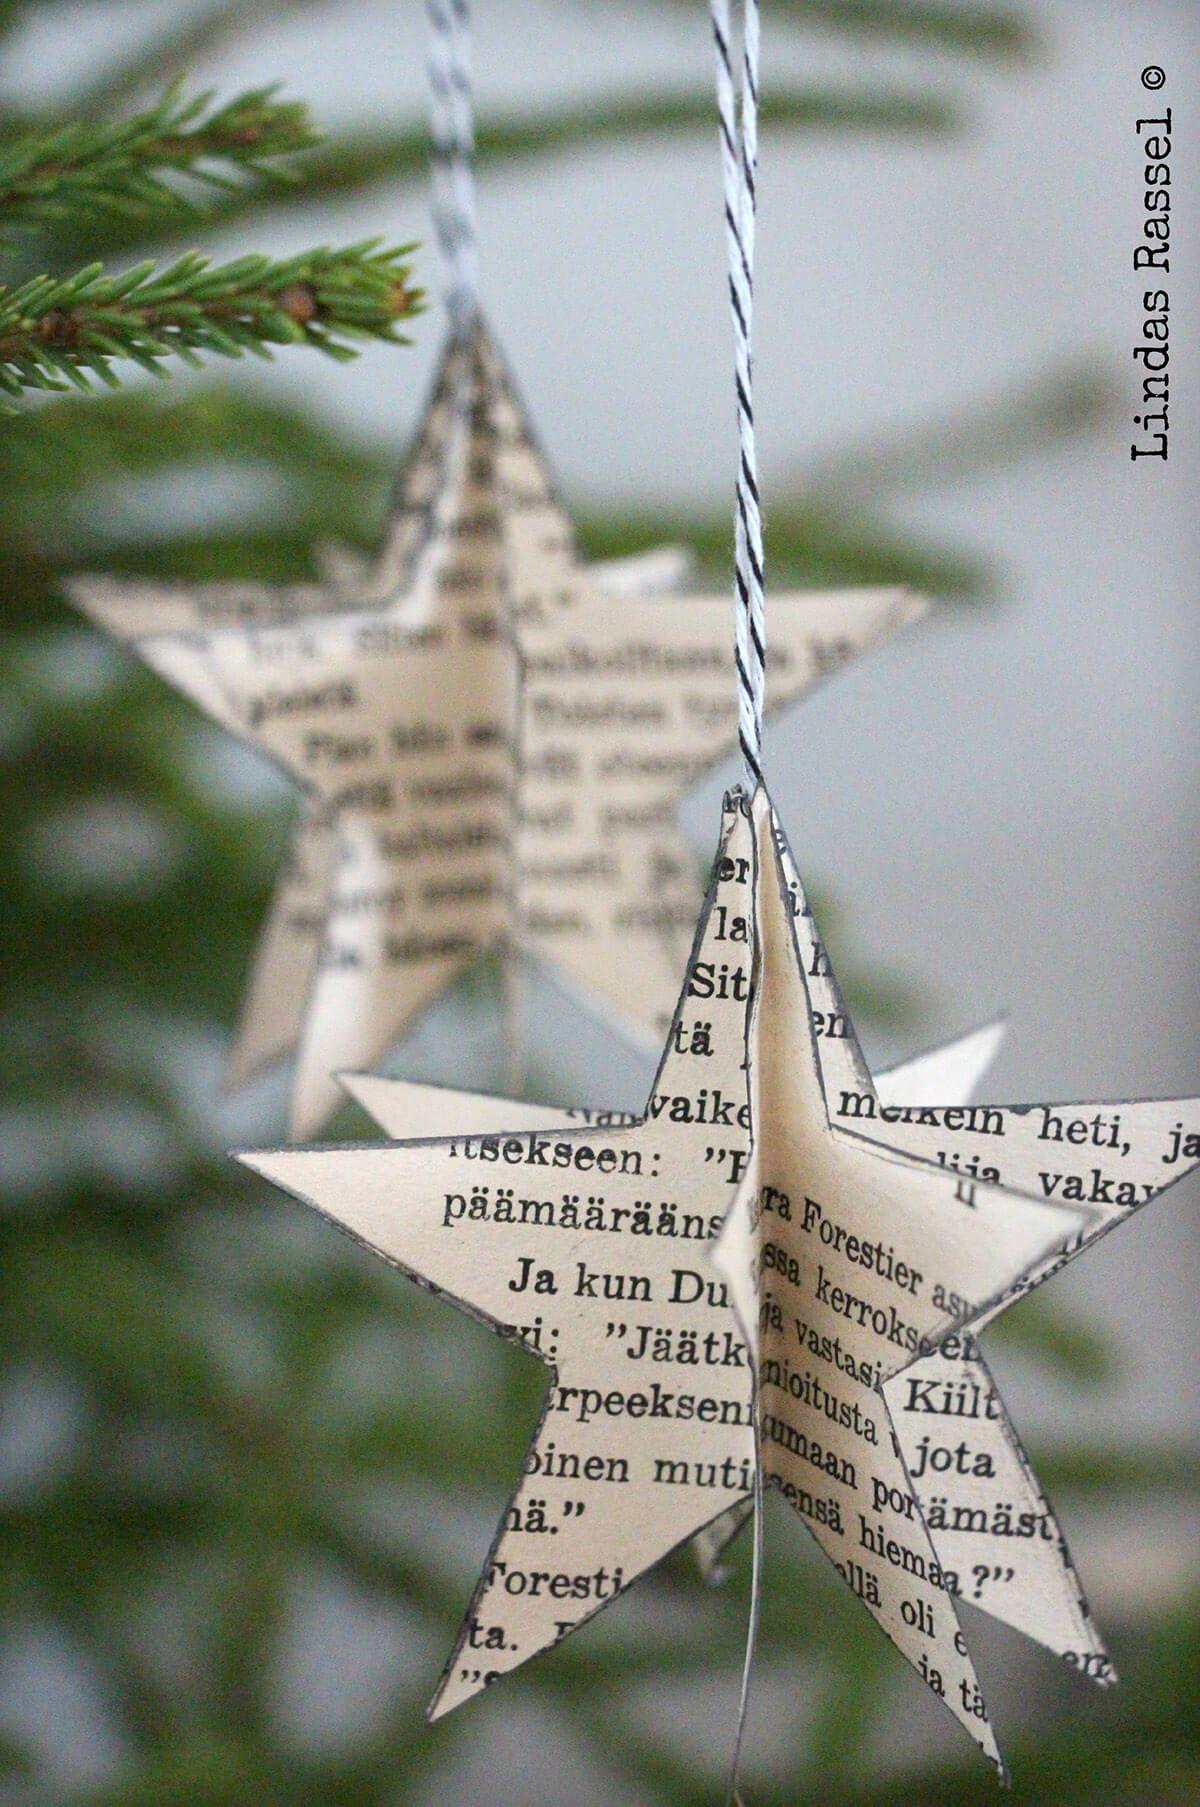 26 Enchanting Diy Old Book Craft Ideas To Repurpose Old Books Christmas Decor Diy Diy Christmas Ornaments Diy Old Books